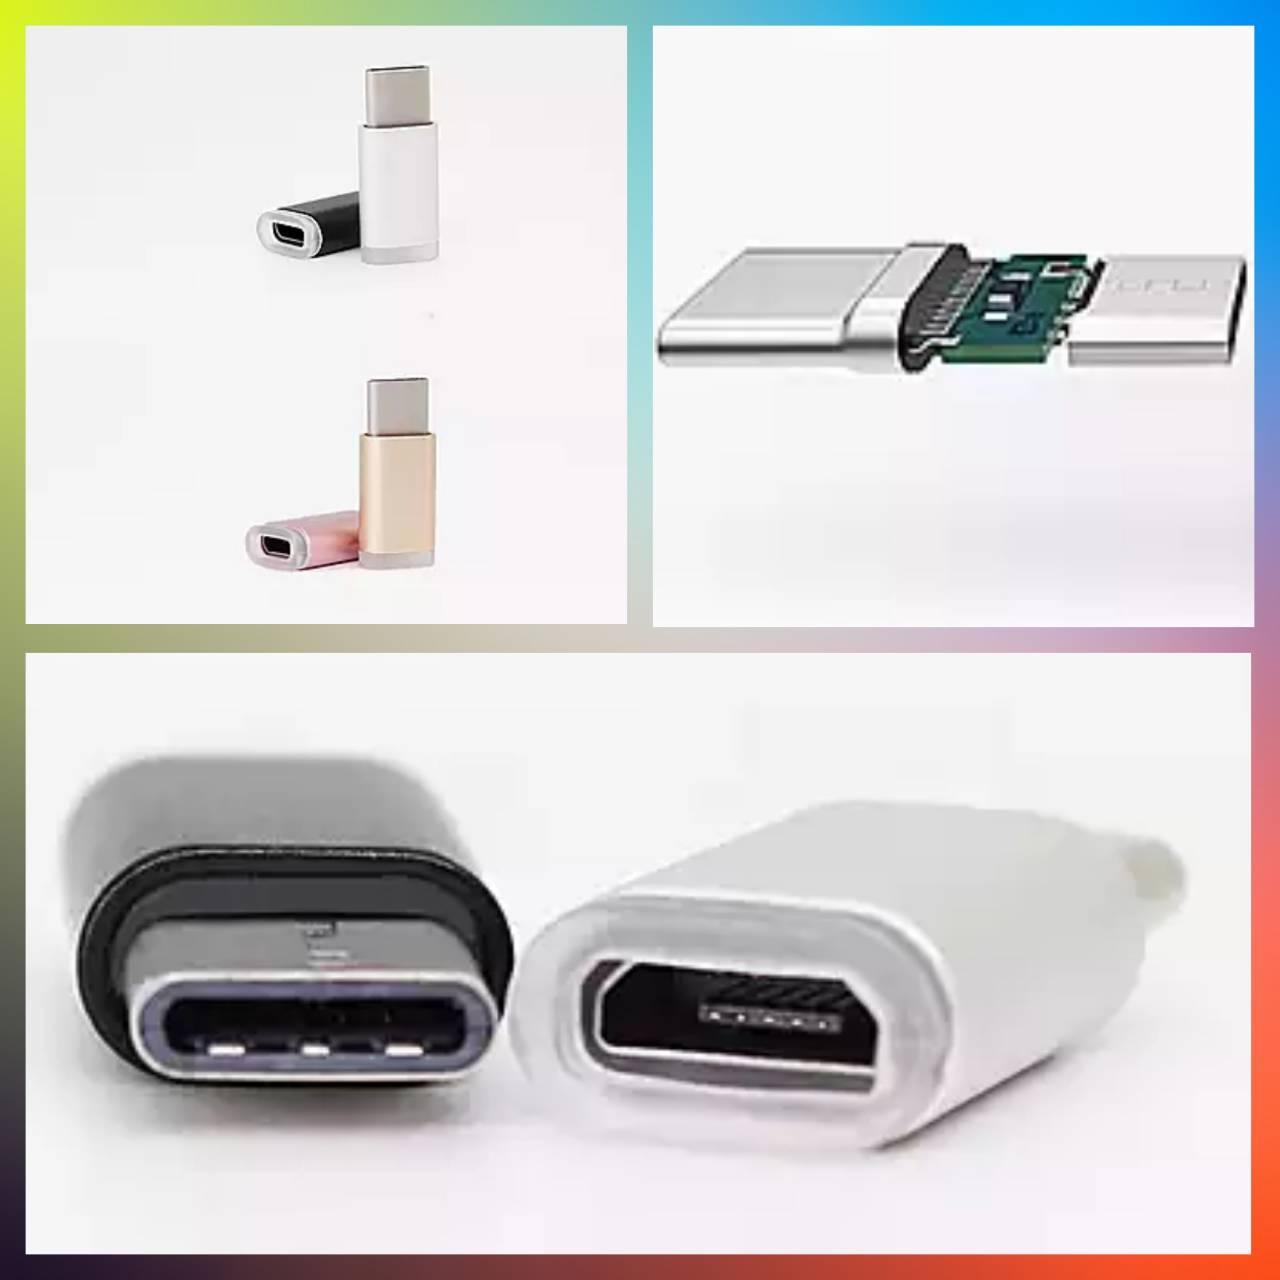 micro-usb to type-c adapter